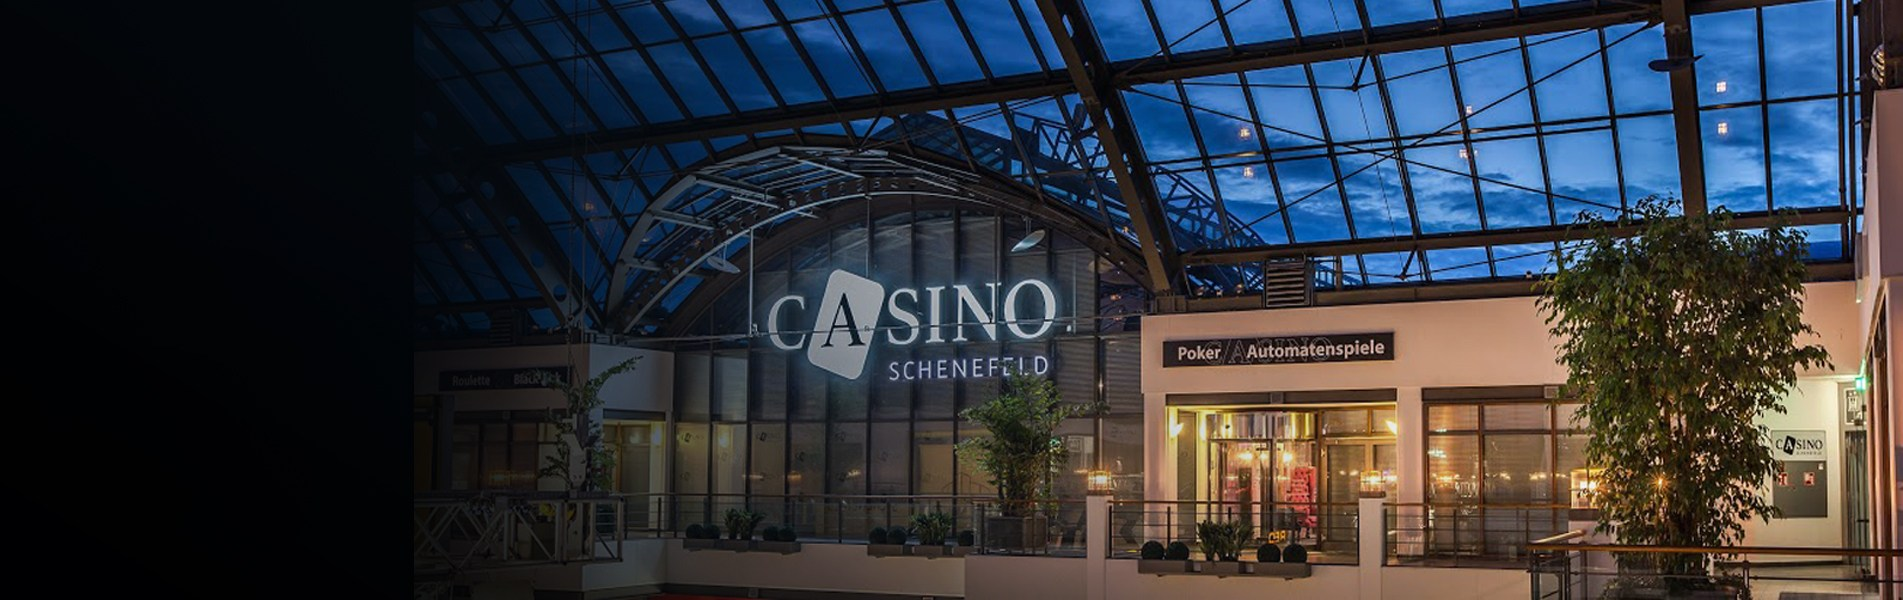 Casino Schenefeld 1